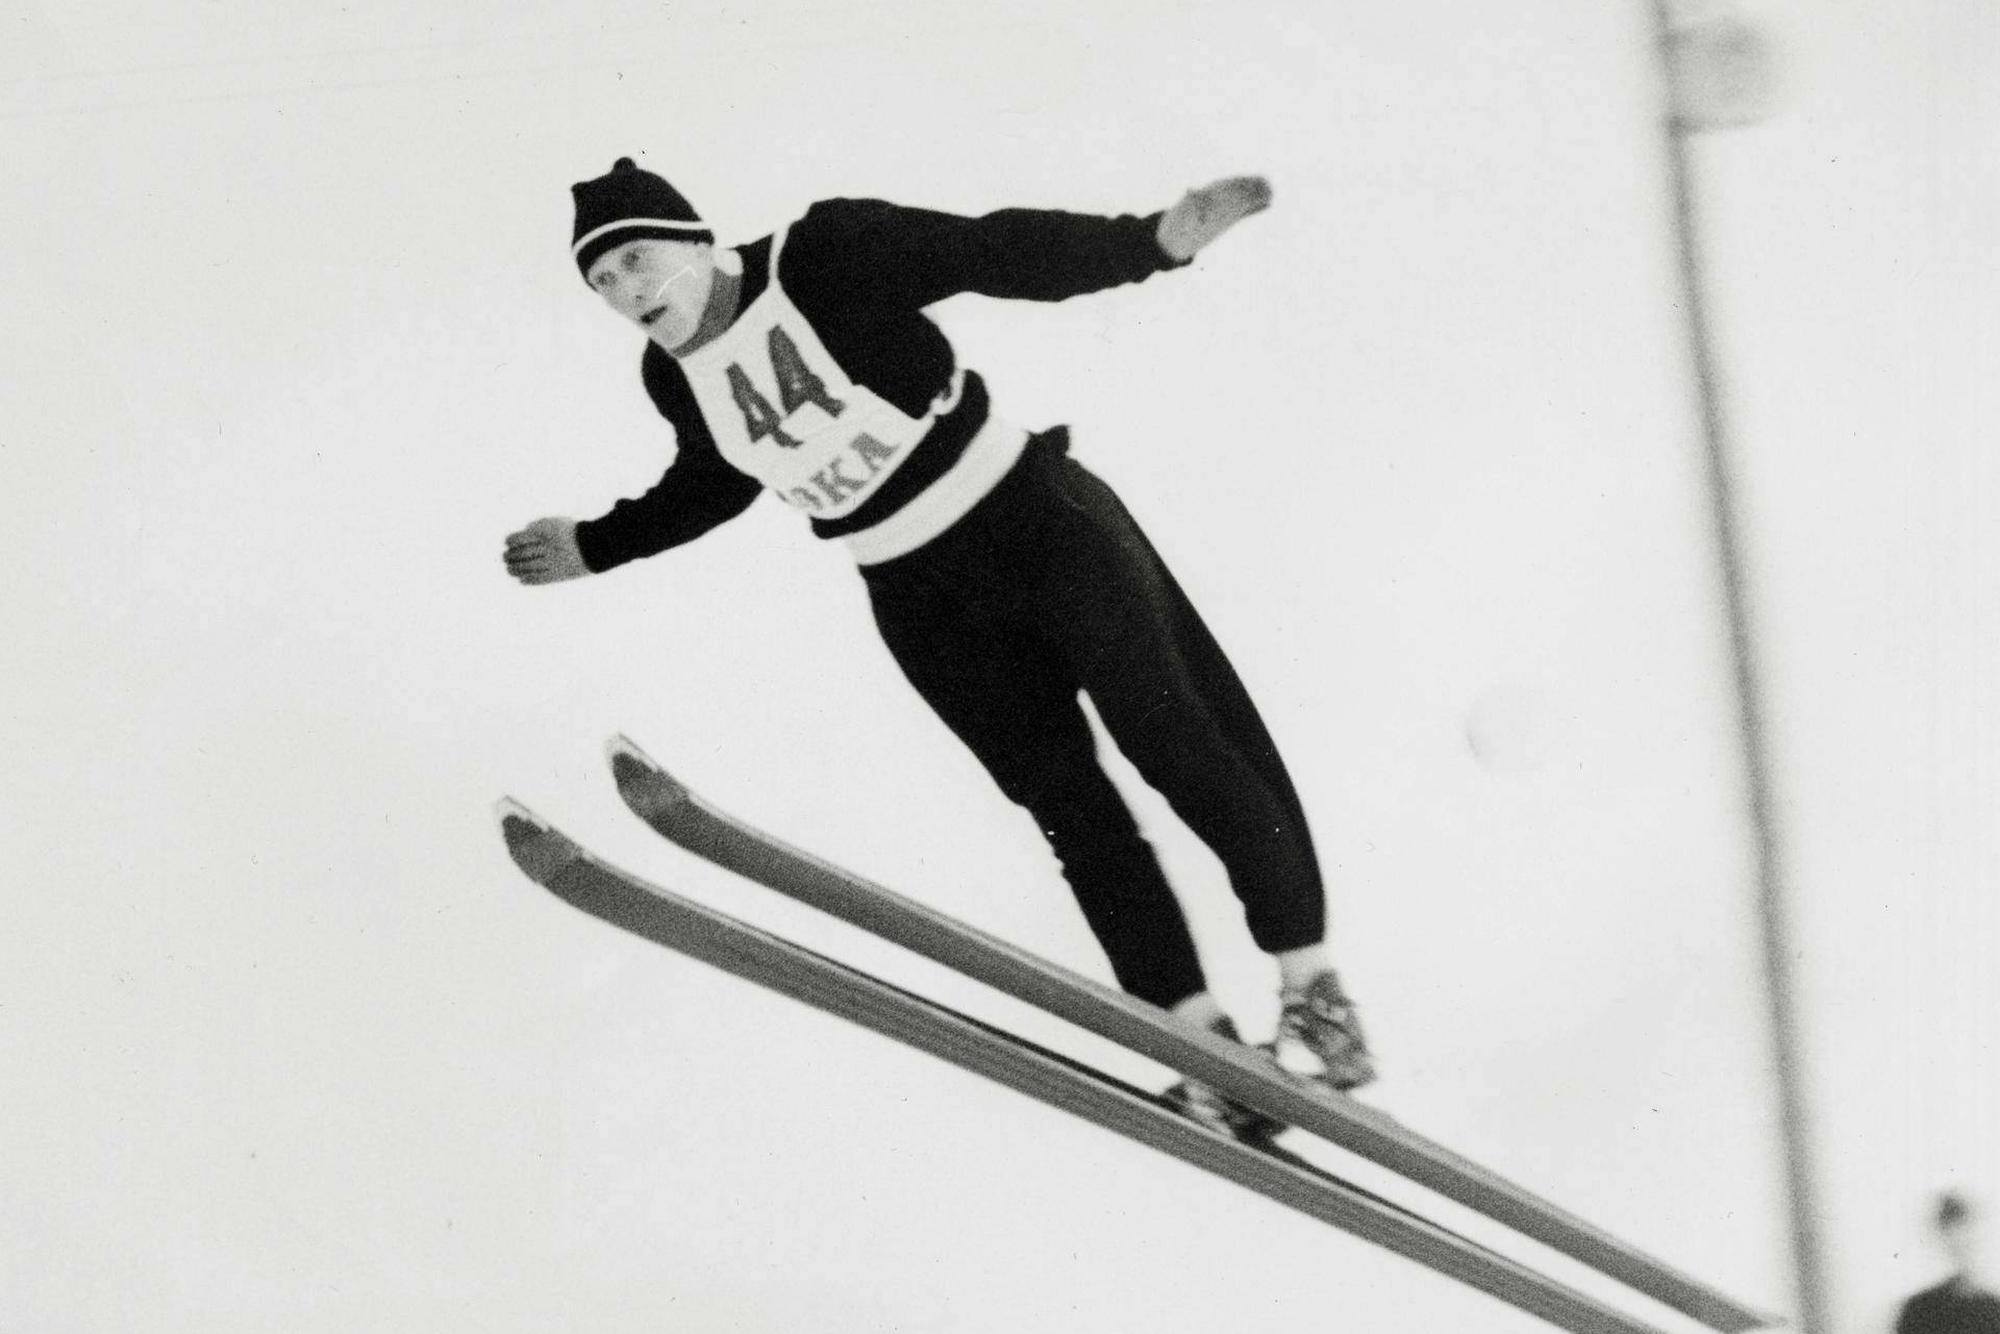 Hemmo Silvennoinen - FINLANDIA (byli skoczkowie)